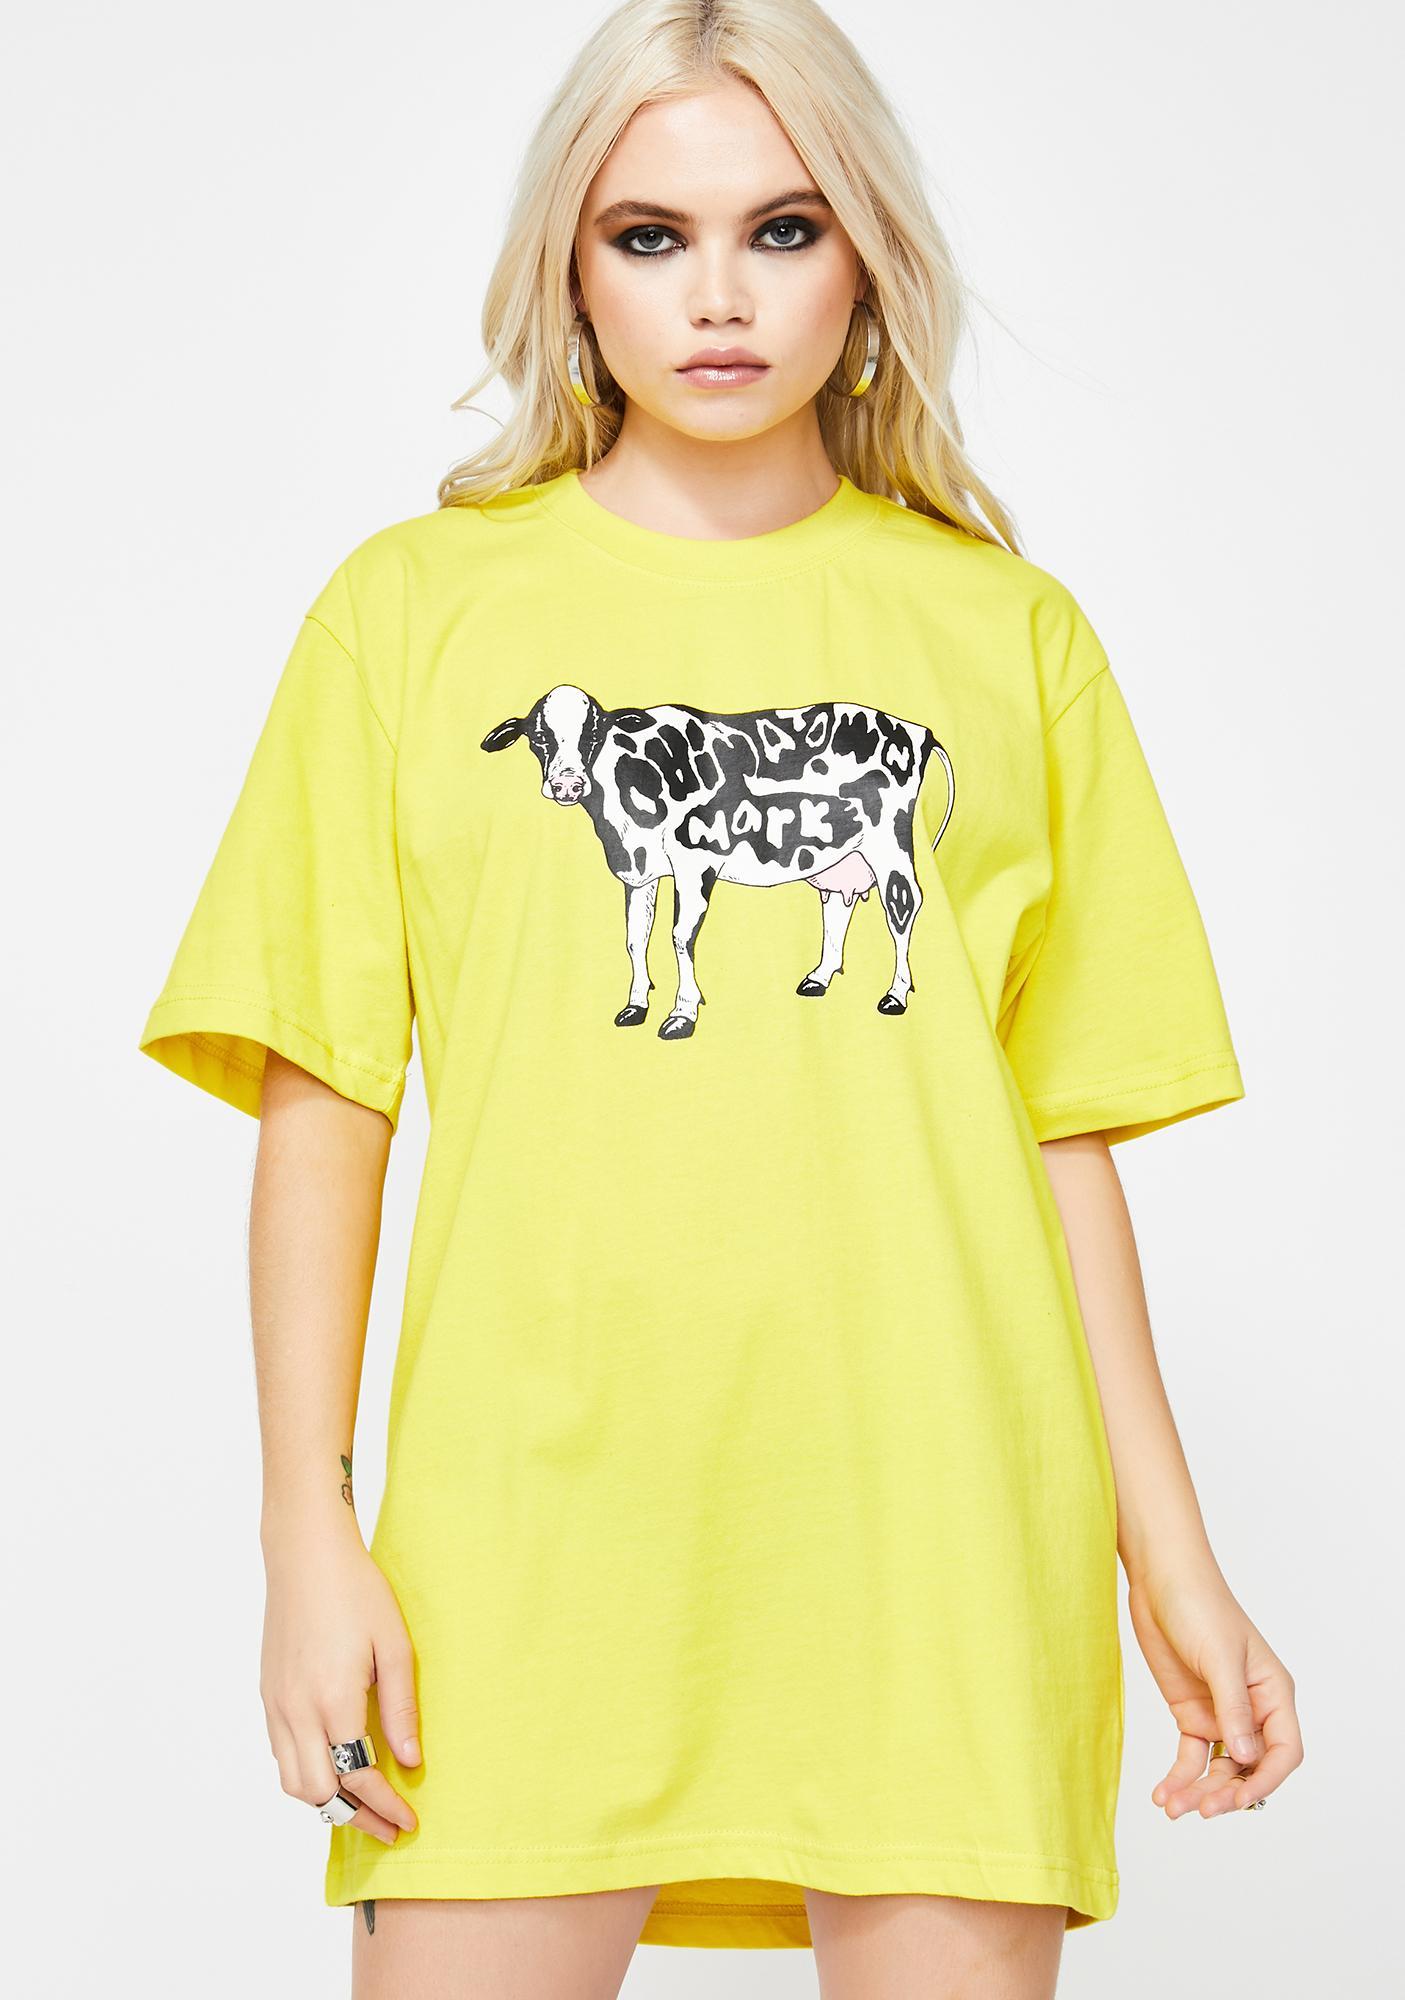 CHINATOWN MARKET Cow Graphic Tee